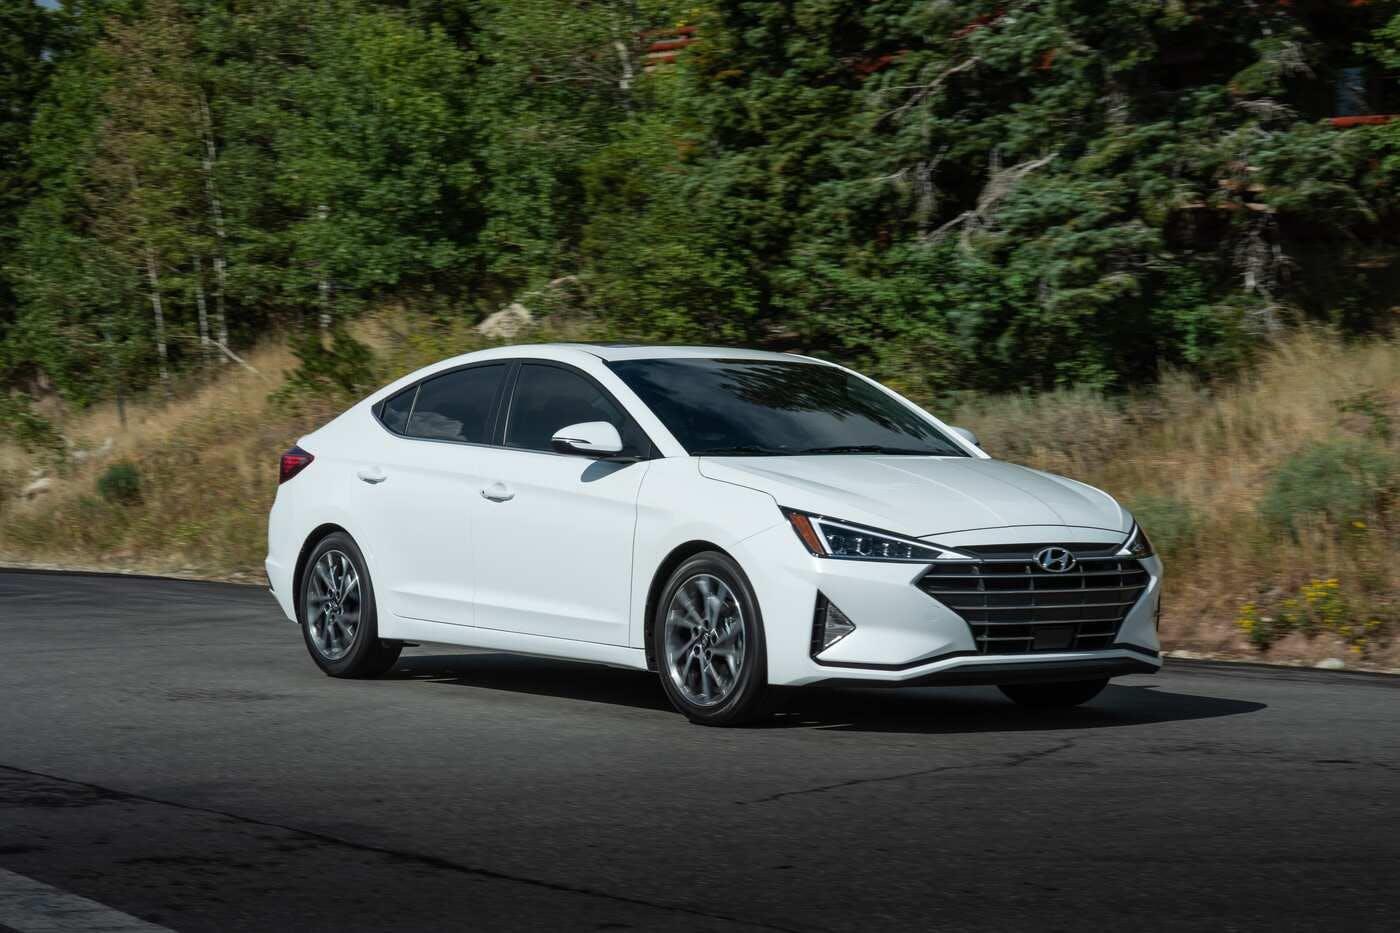 Get 2020 Hyundai Elantra